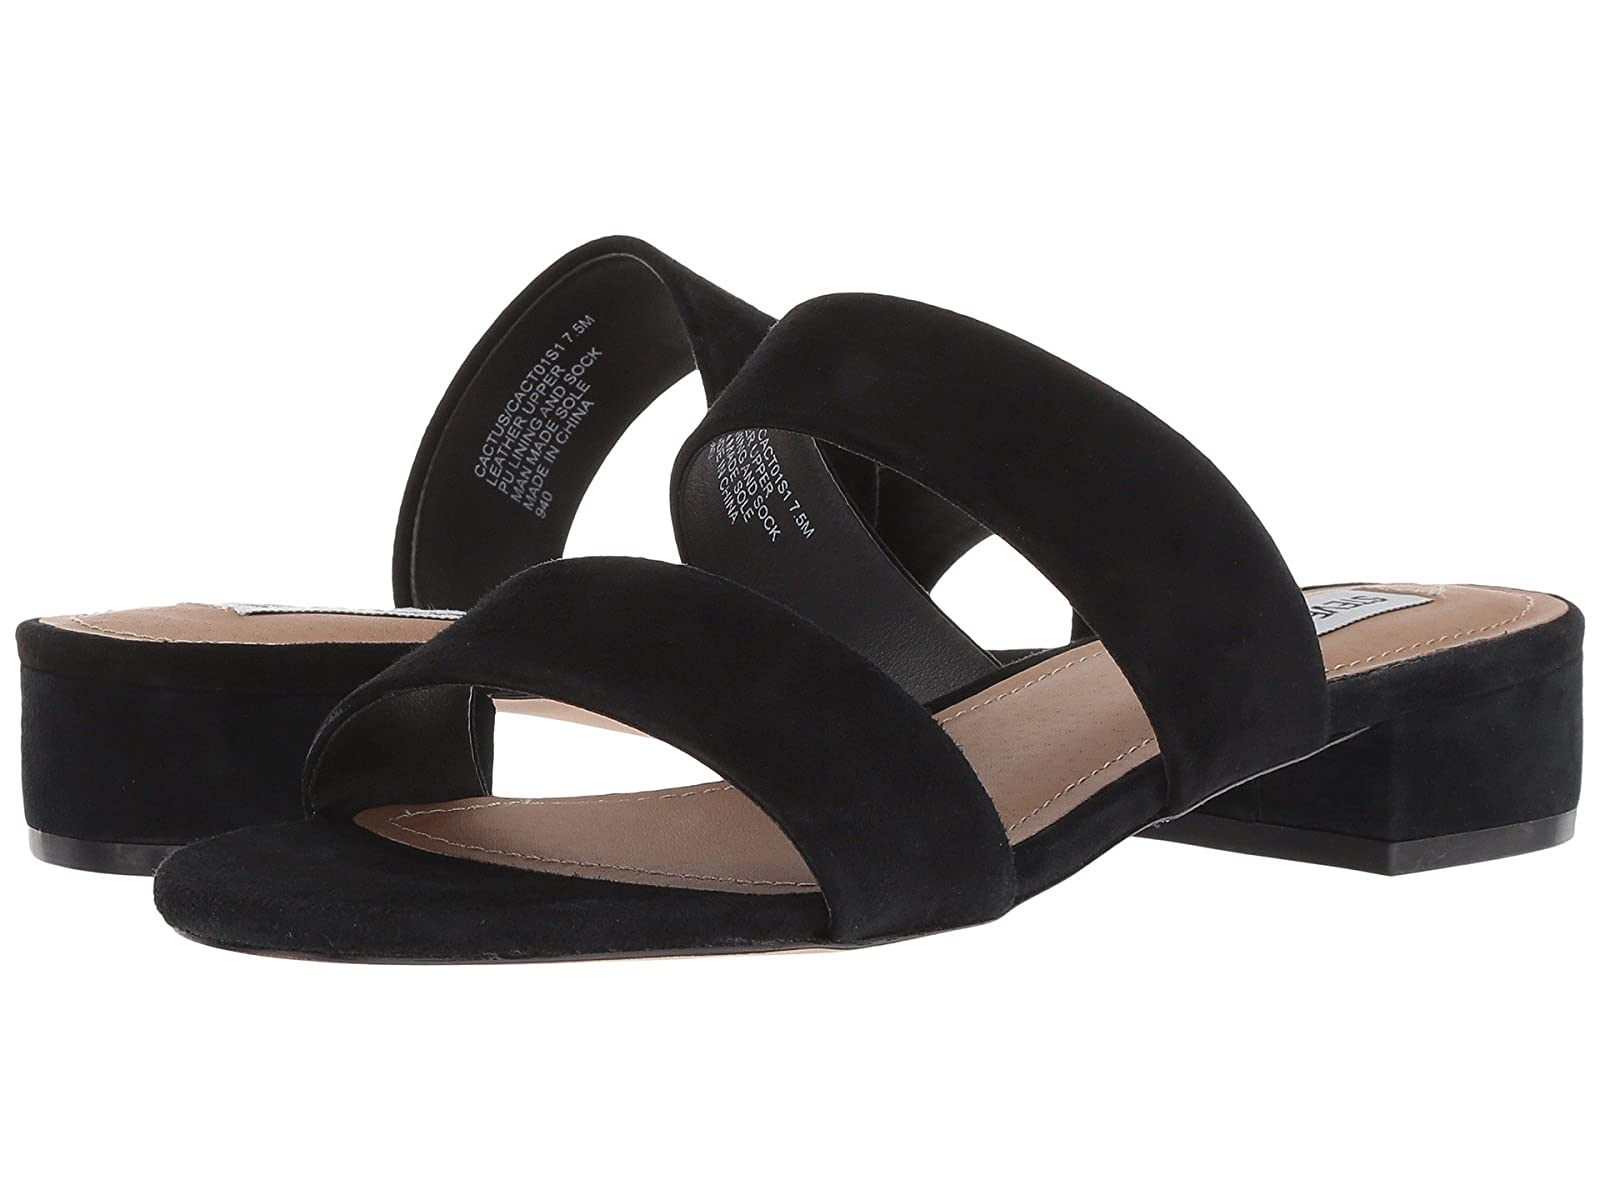 Steve Madden First/Gentlemen/Ladies Cactus Slide Sandal /Quality First/Gentlemen/Ladies Madden f59daa